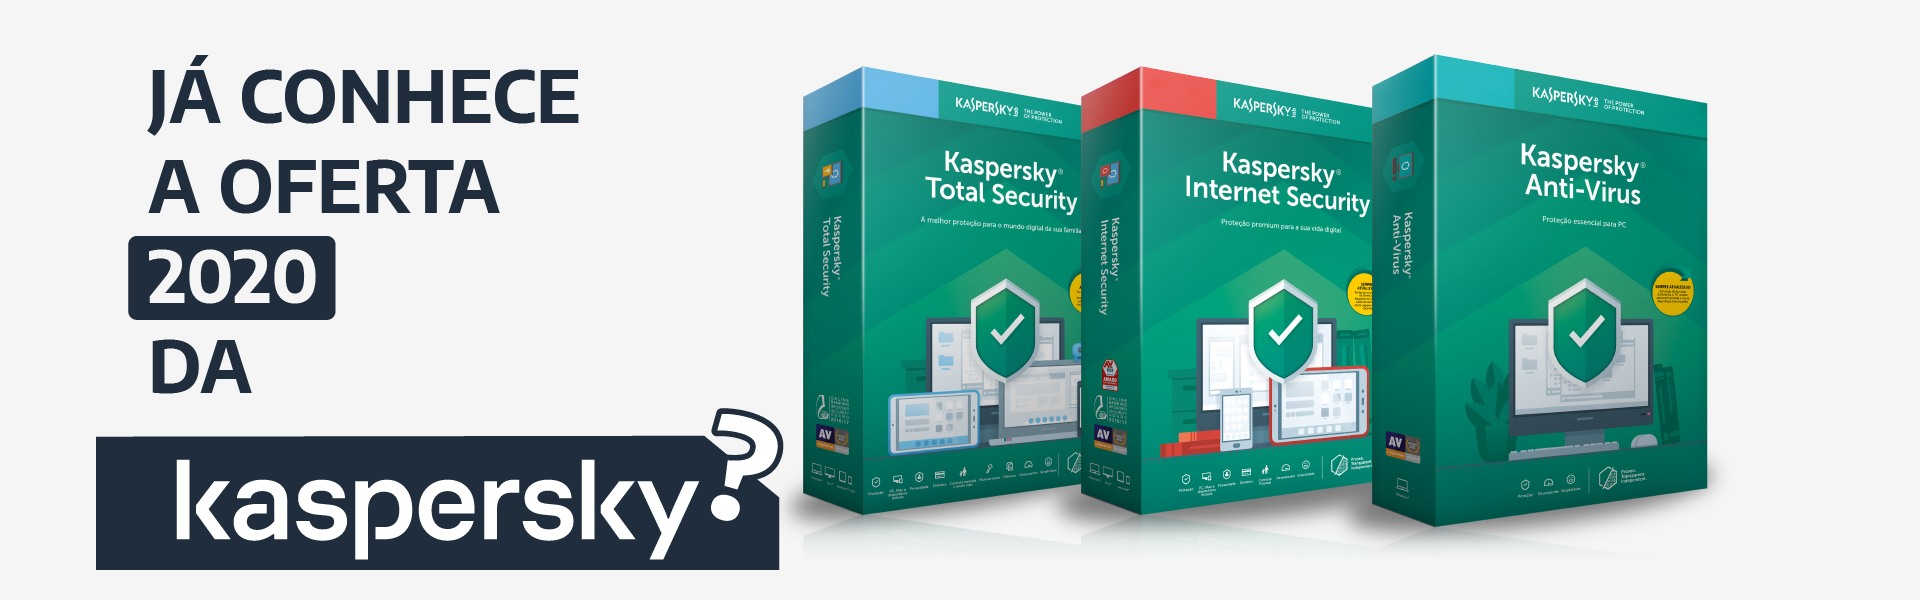 Oferta Kaspersky 2020